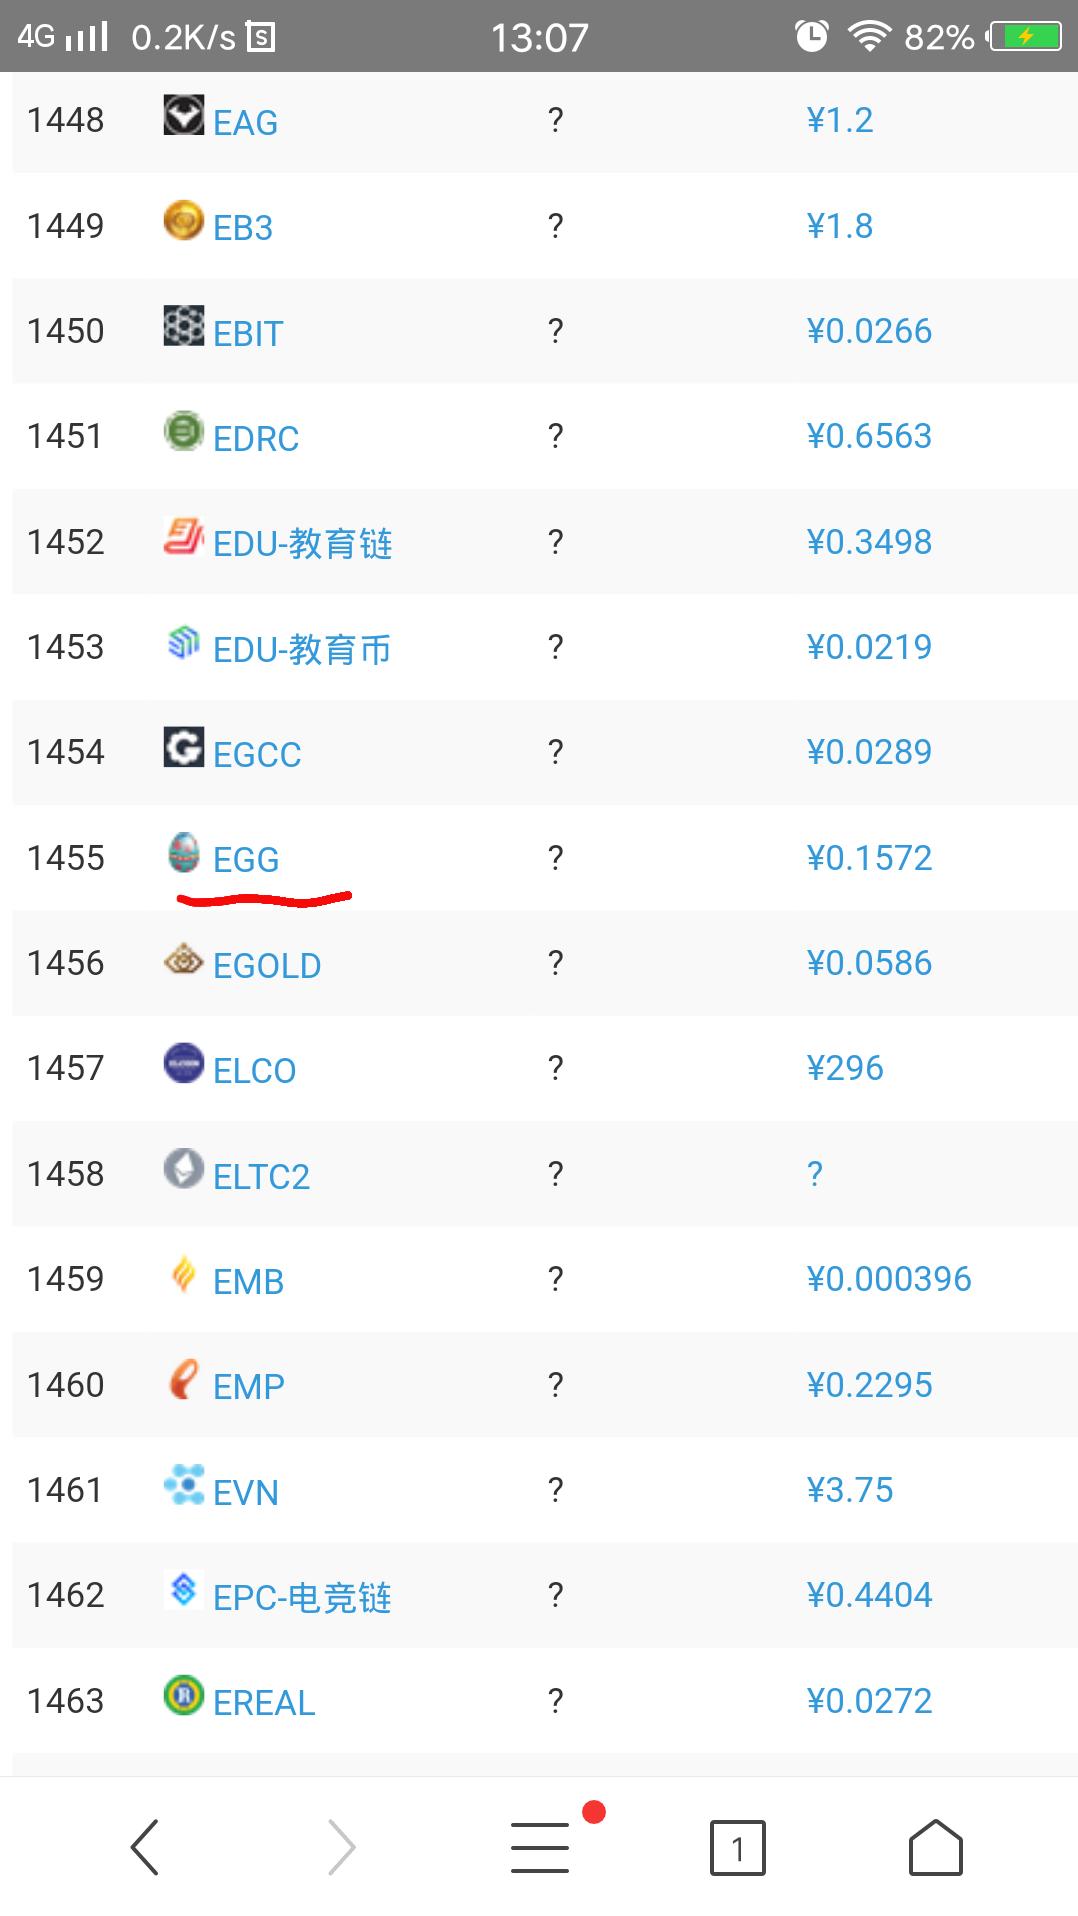 Eggone福蛋火了一夜之间涨240000 公信宝、网